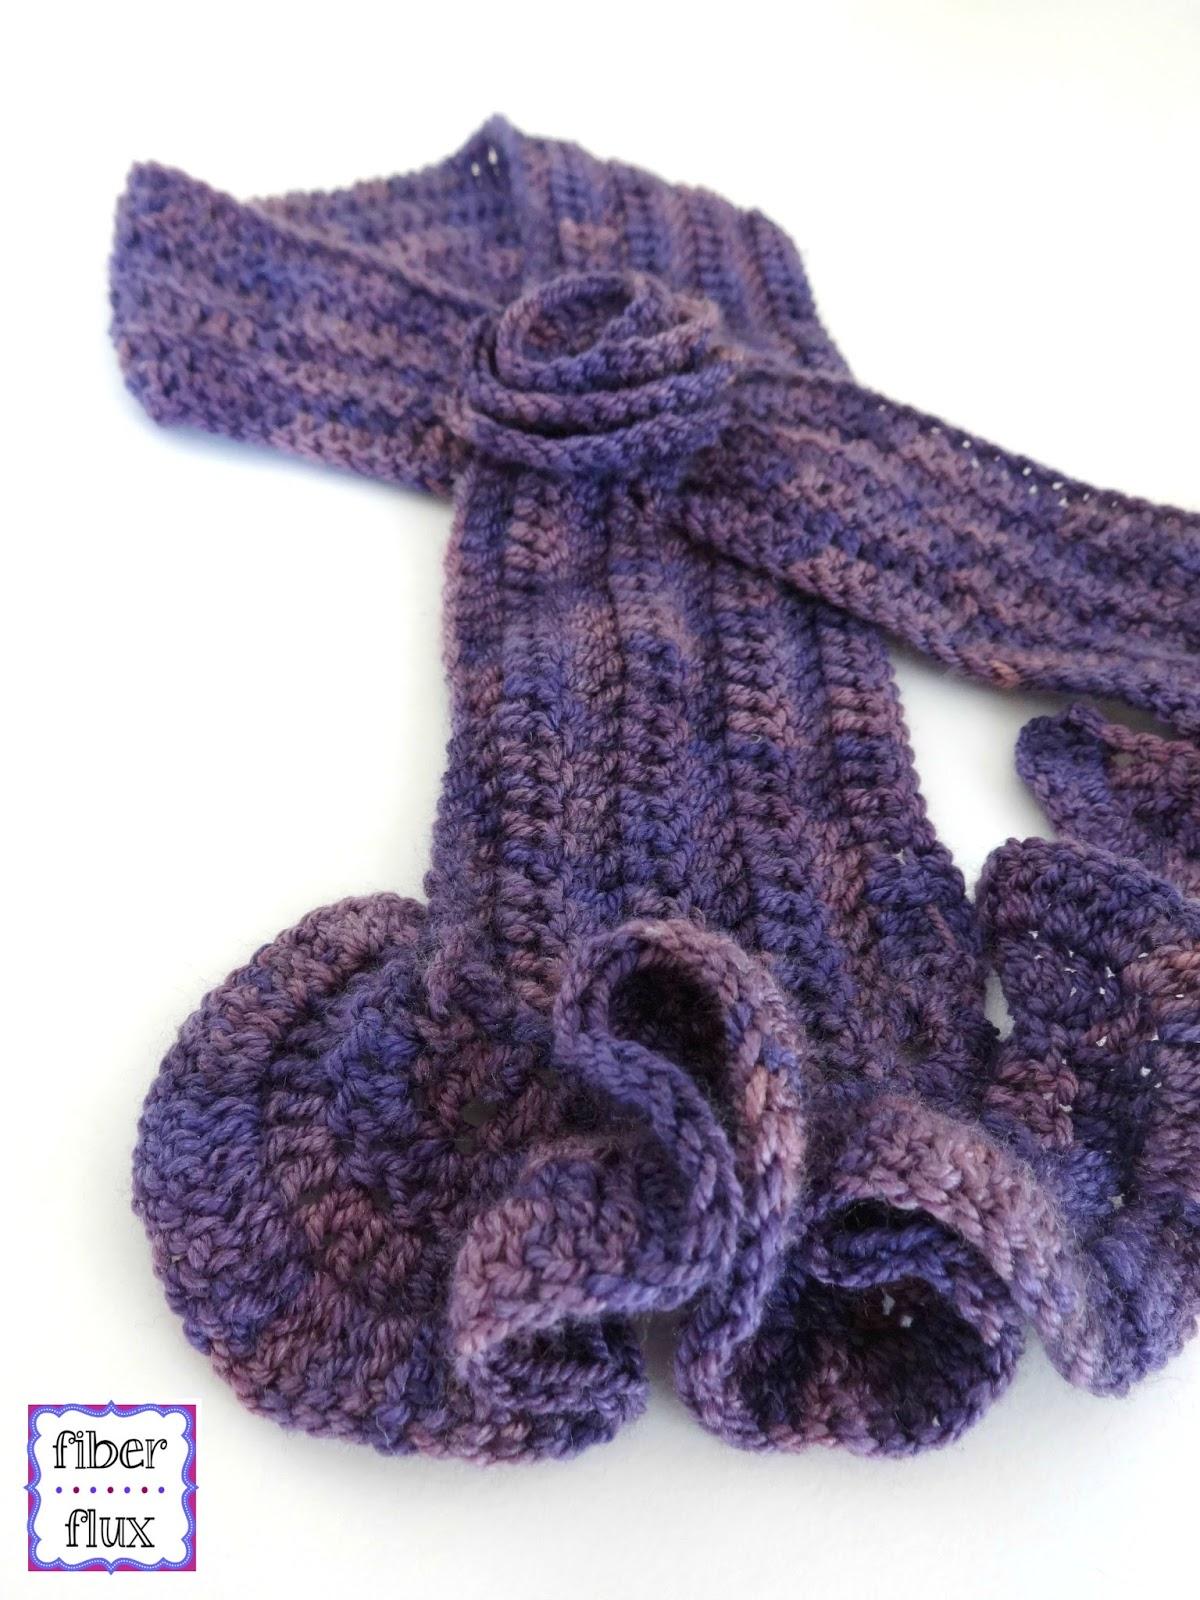 Fiber Flux: Free Crochet Pattern...Vintage Blossom Keyhole Scarf!